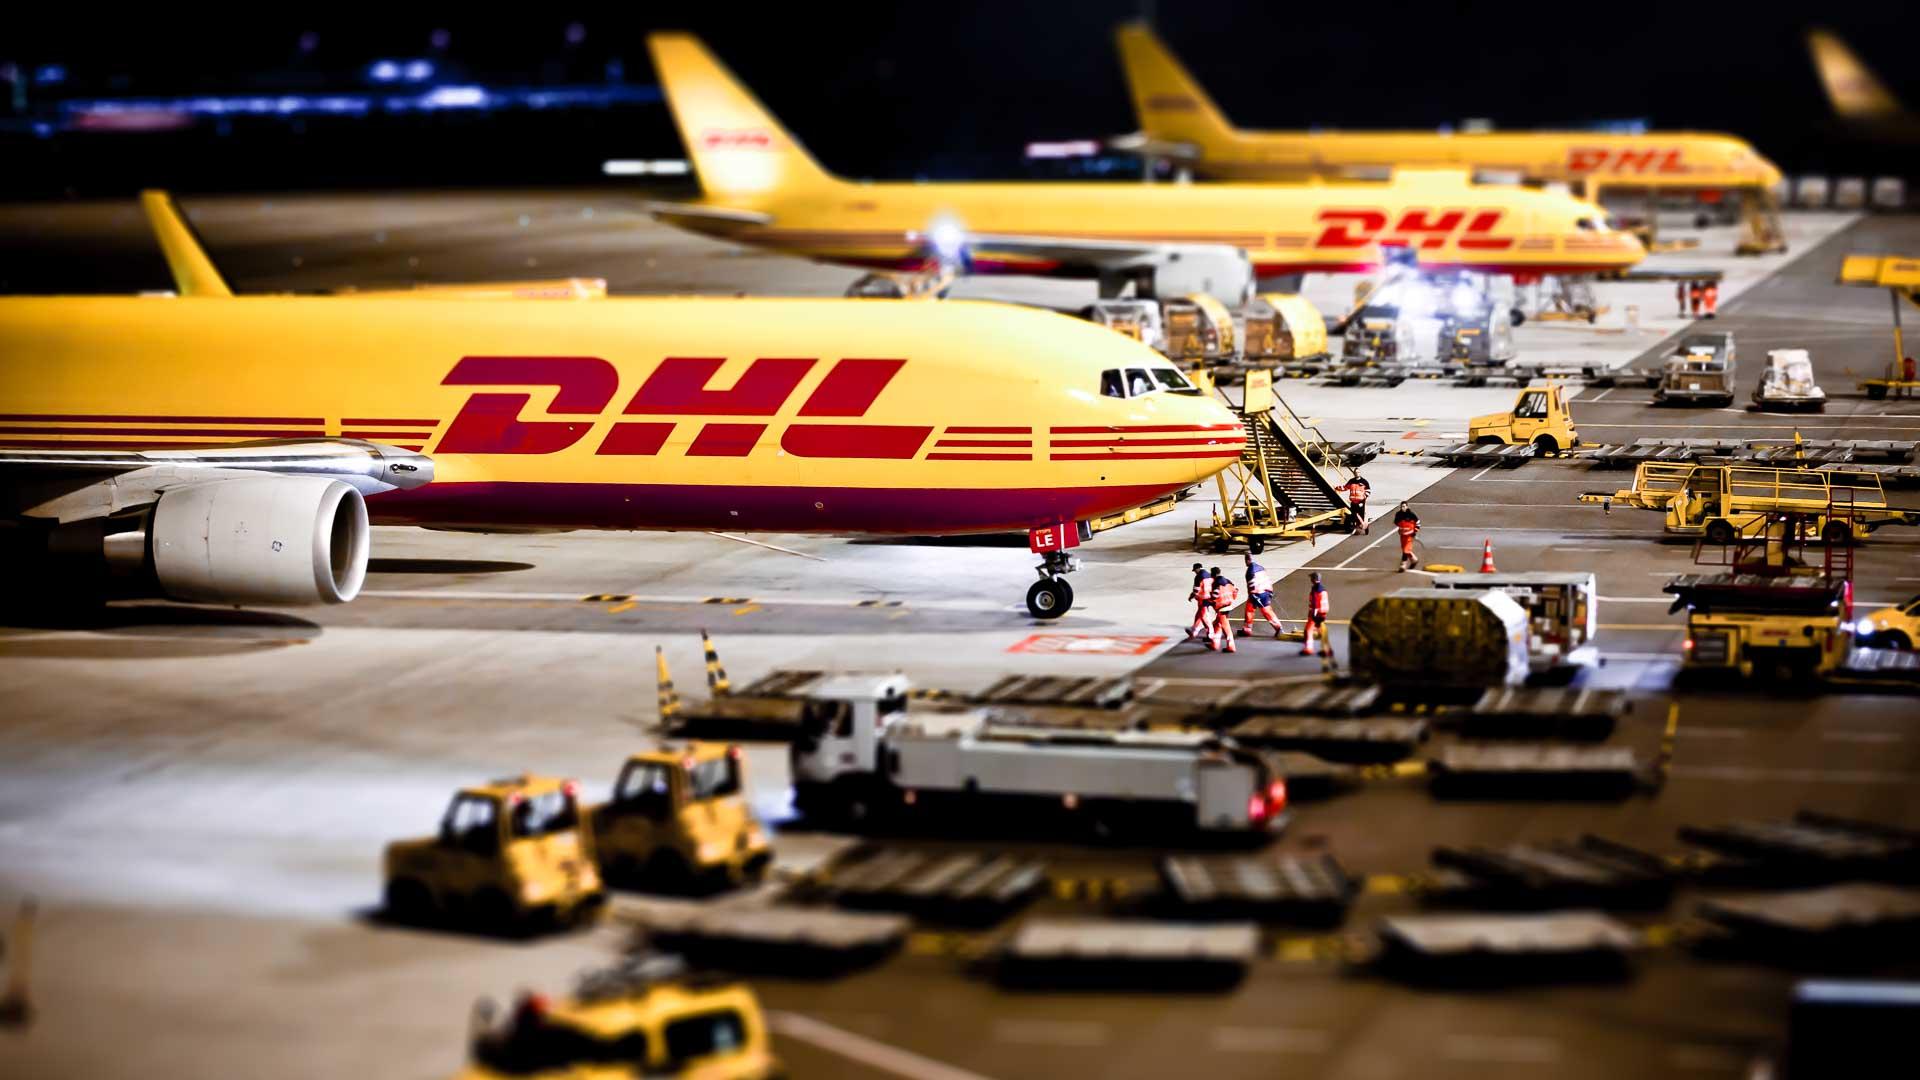 DHL Frachtflugzeuge am Flughafen Leipzig.